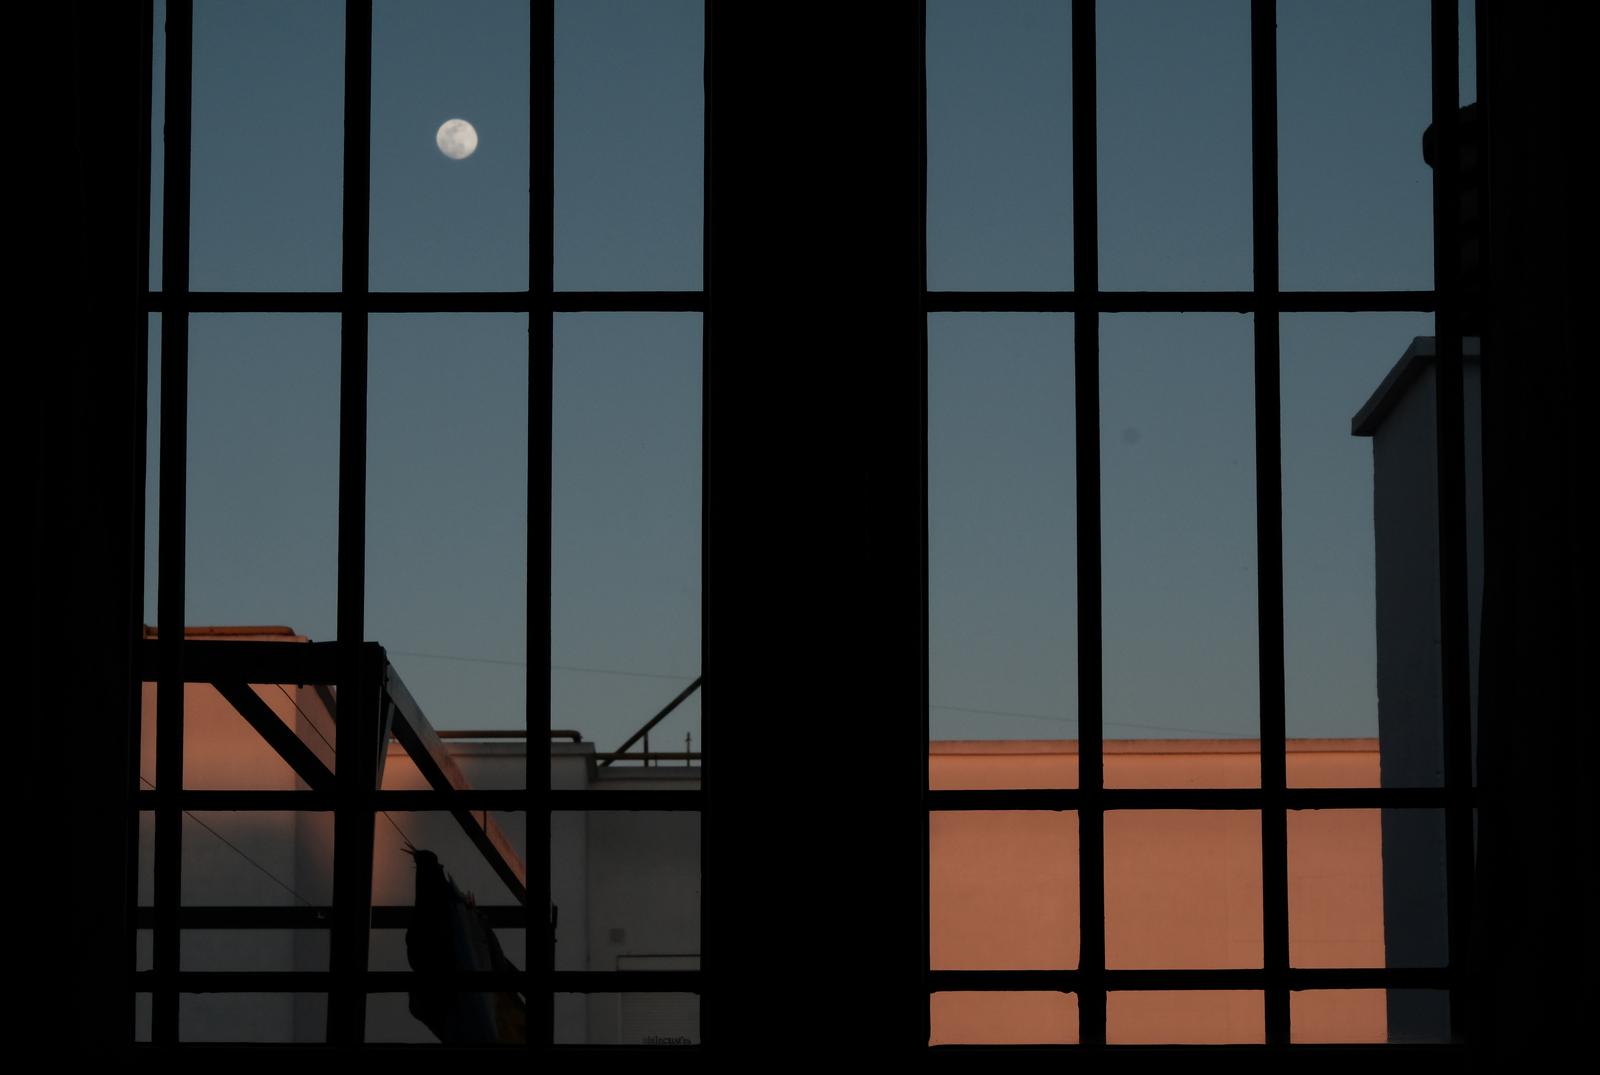 Moonrise - Derek